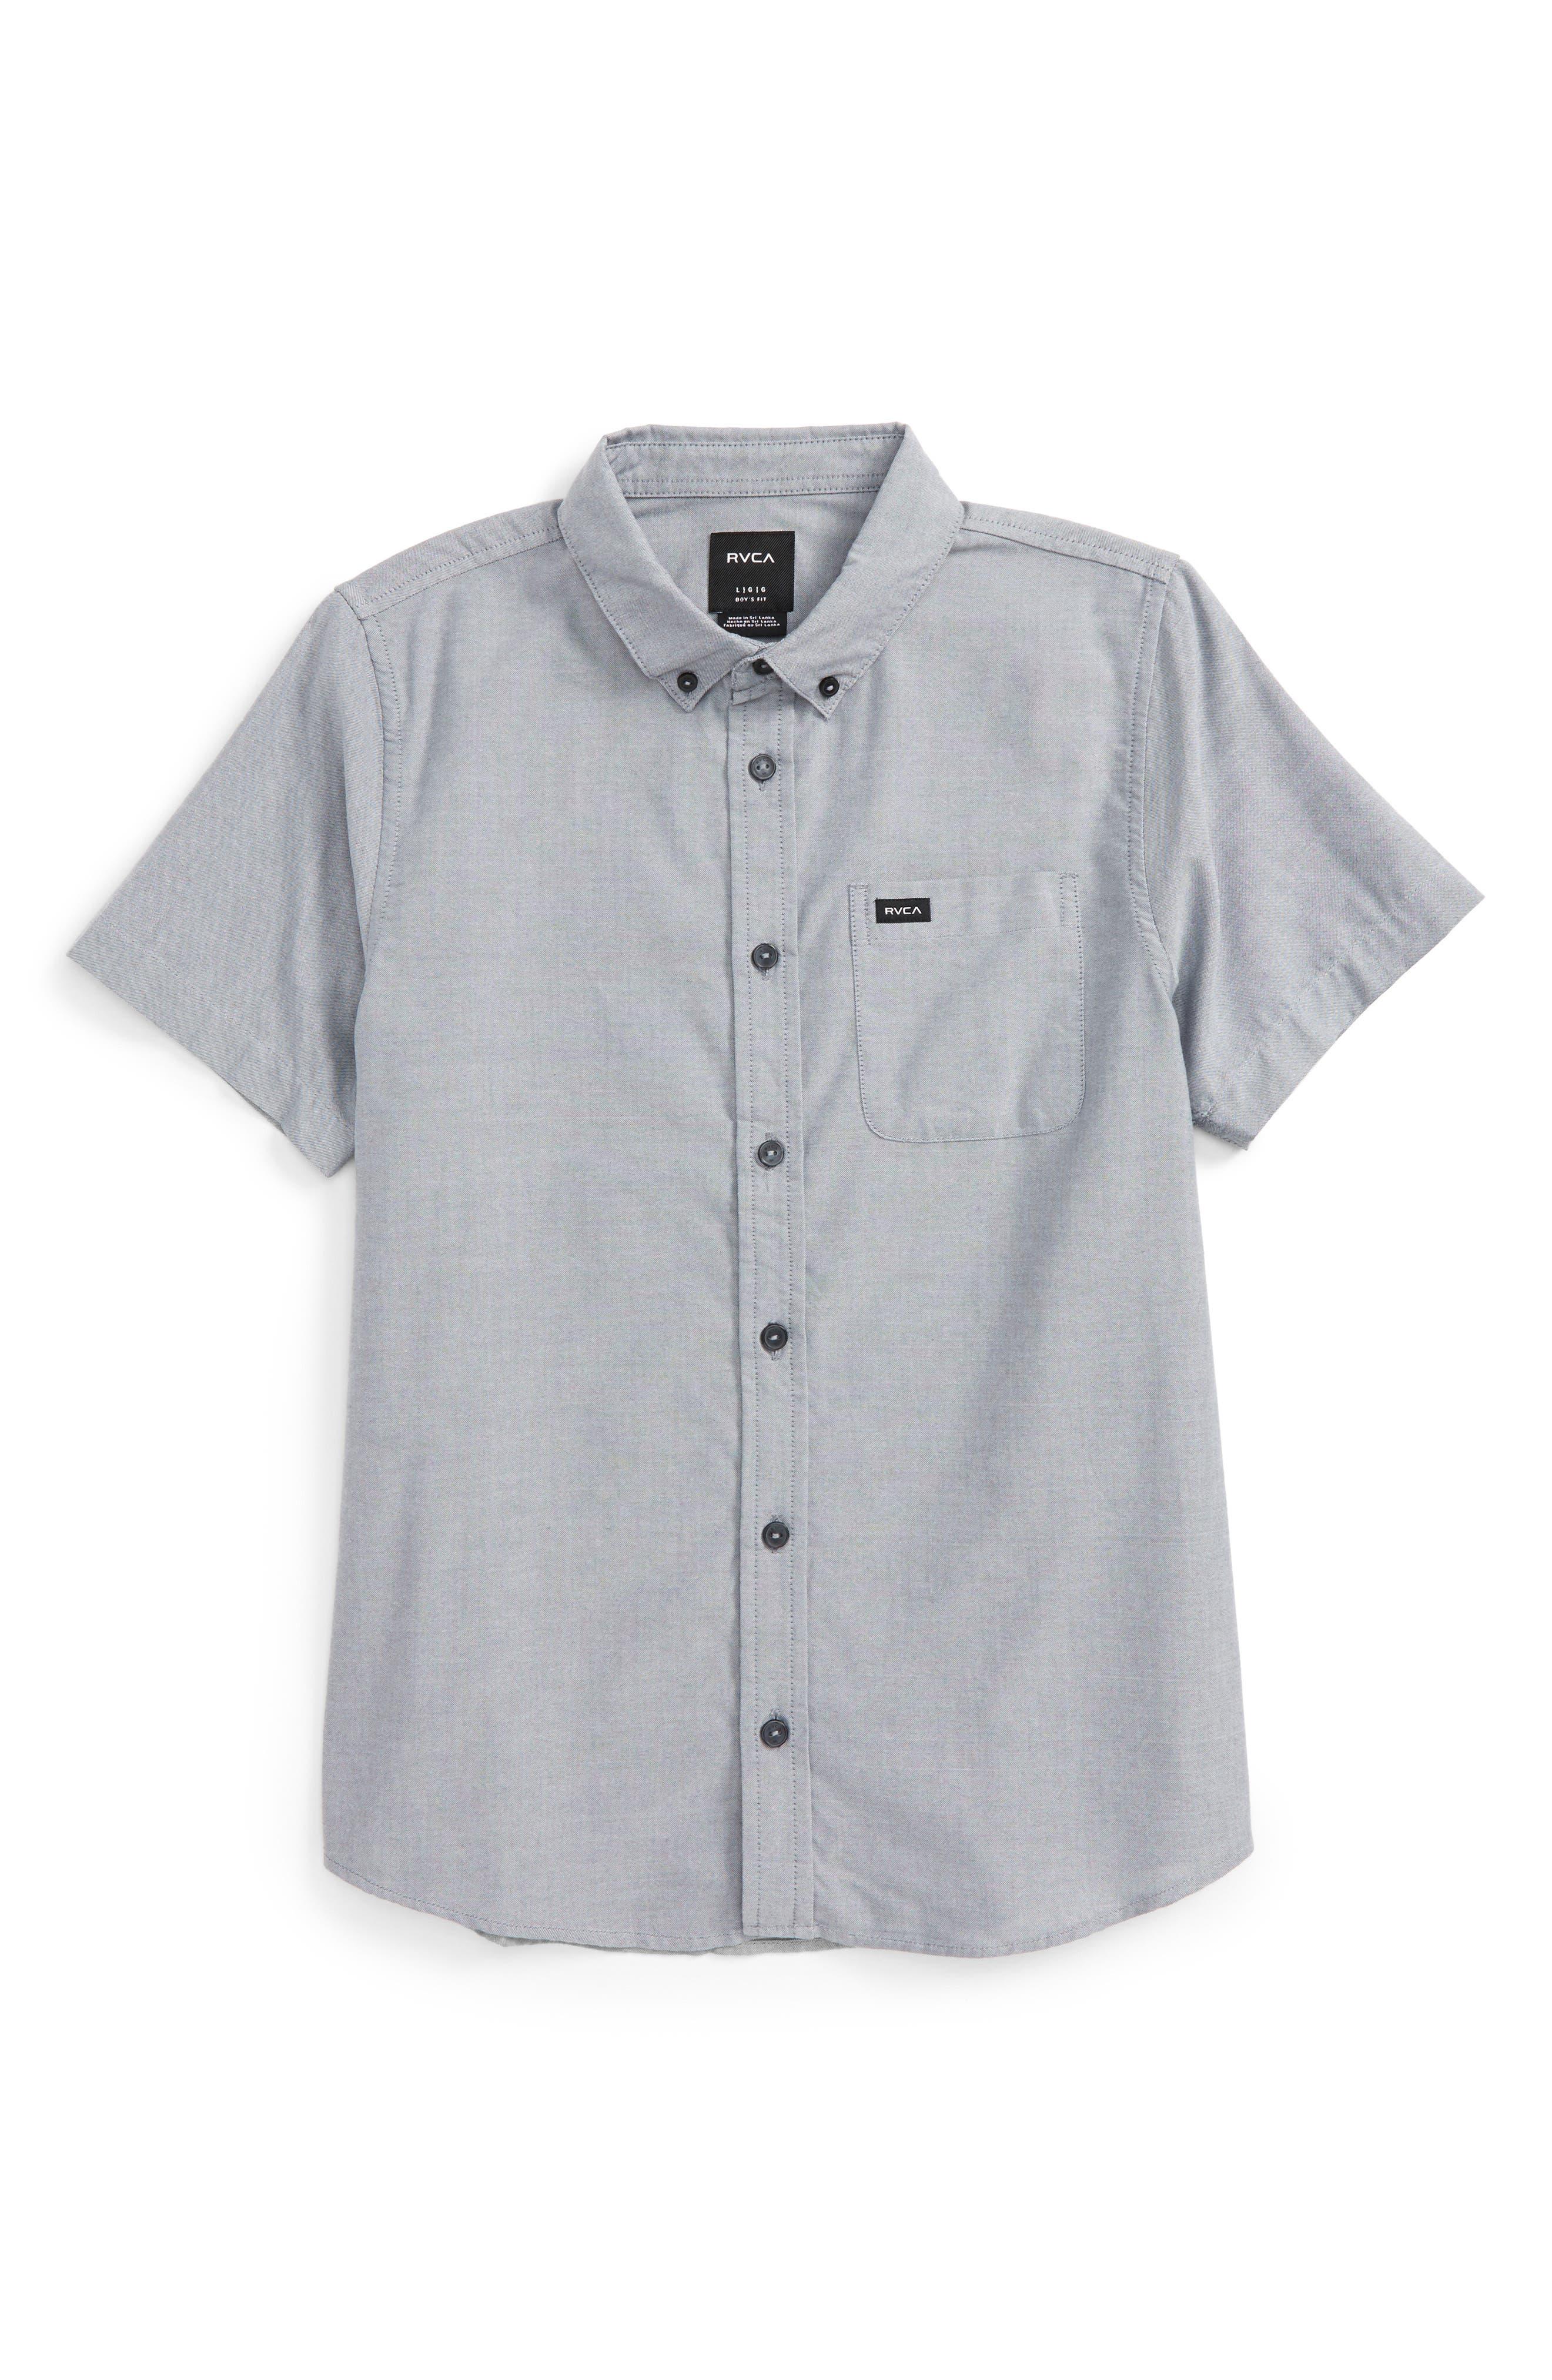 Alternate Image 1 Selected - RVCA 'That'll Do' Woven Shirt (Big Boys)